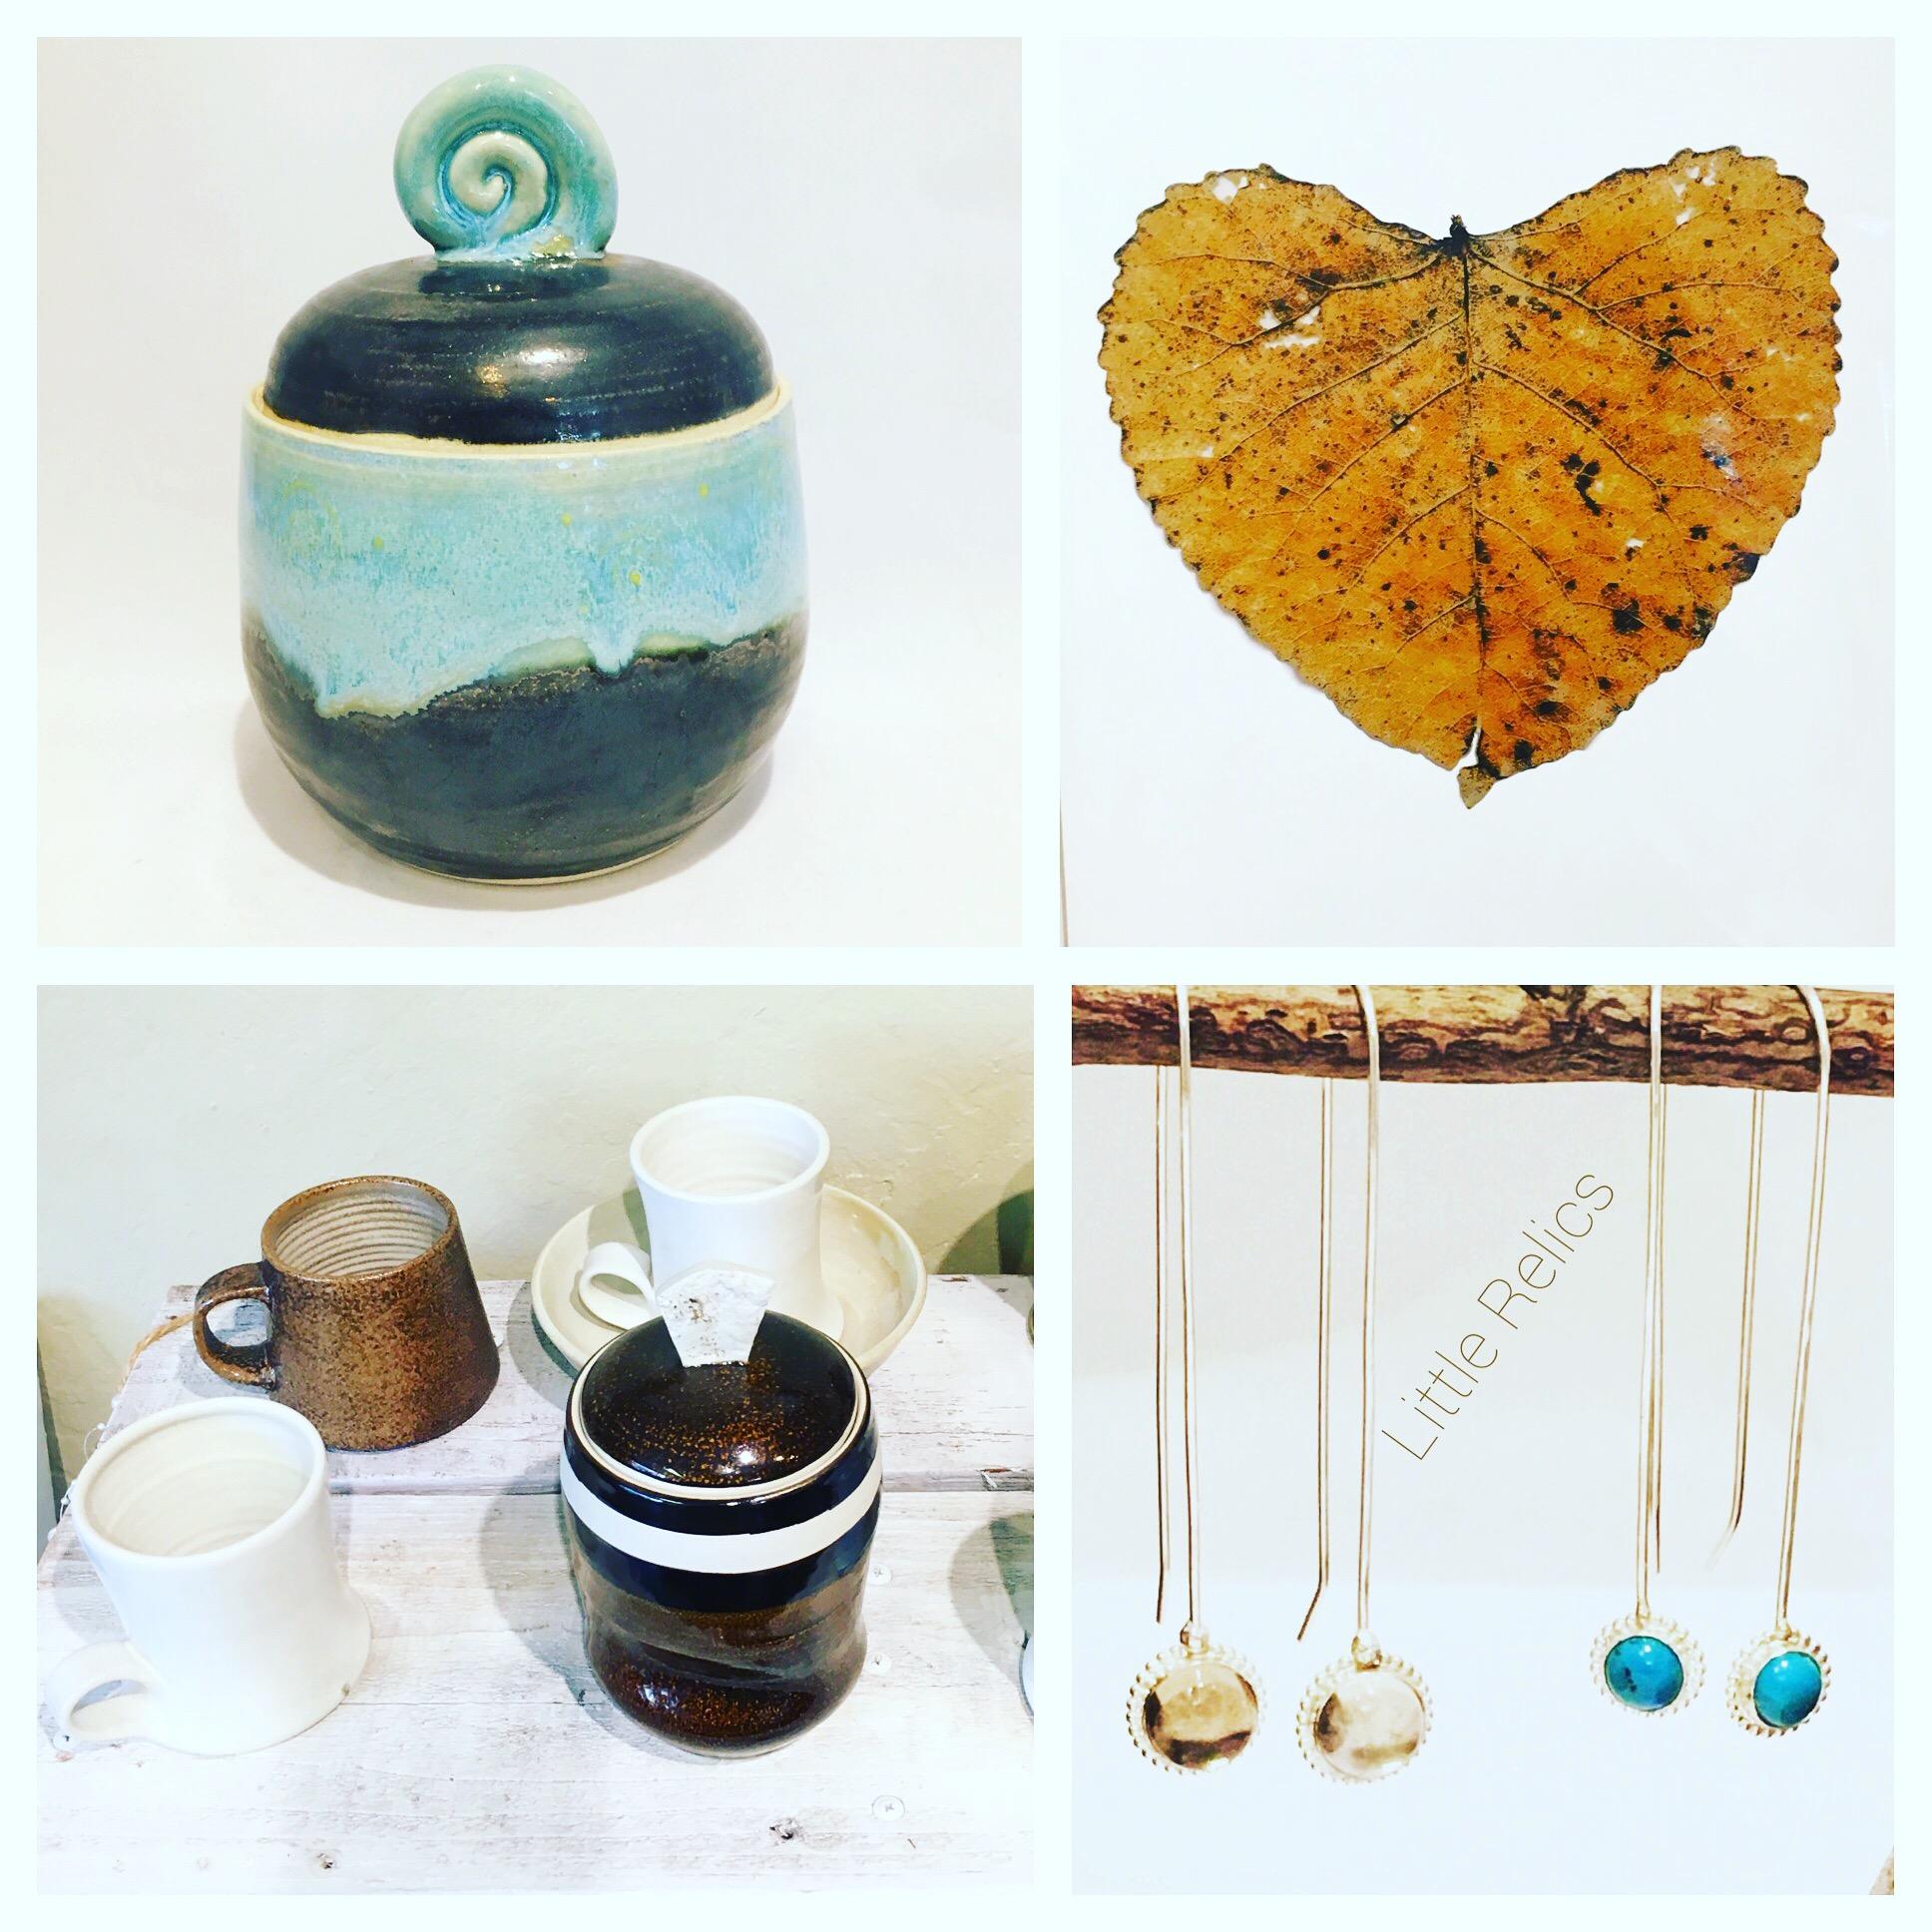 Ceramic Vessels by Elizabeth Wocasek, Mugs by Kyle Lawson & Prints by local Photgraphers